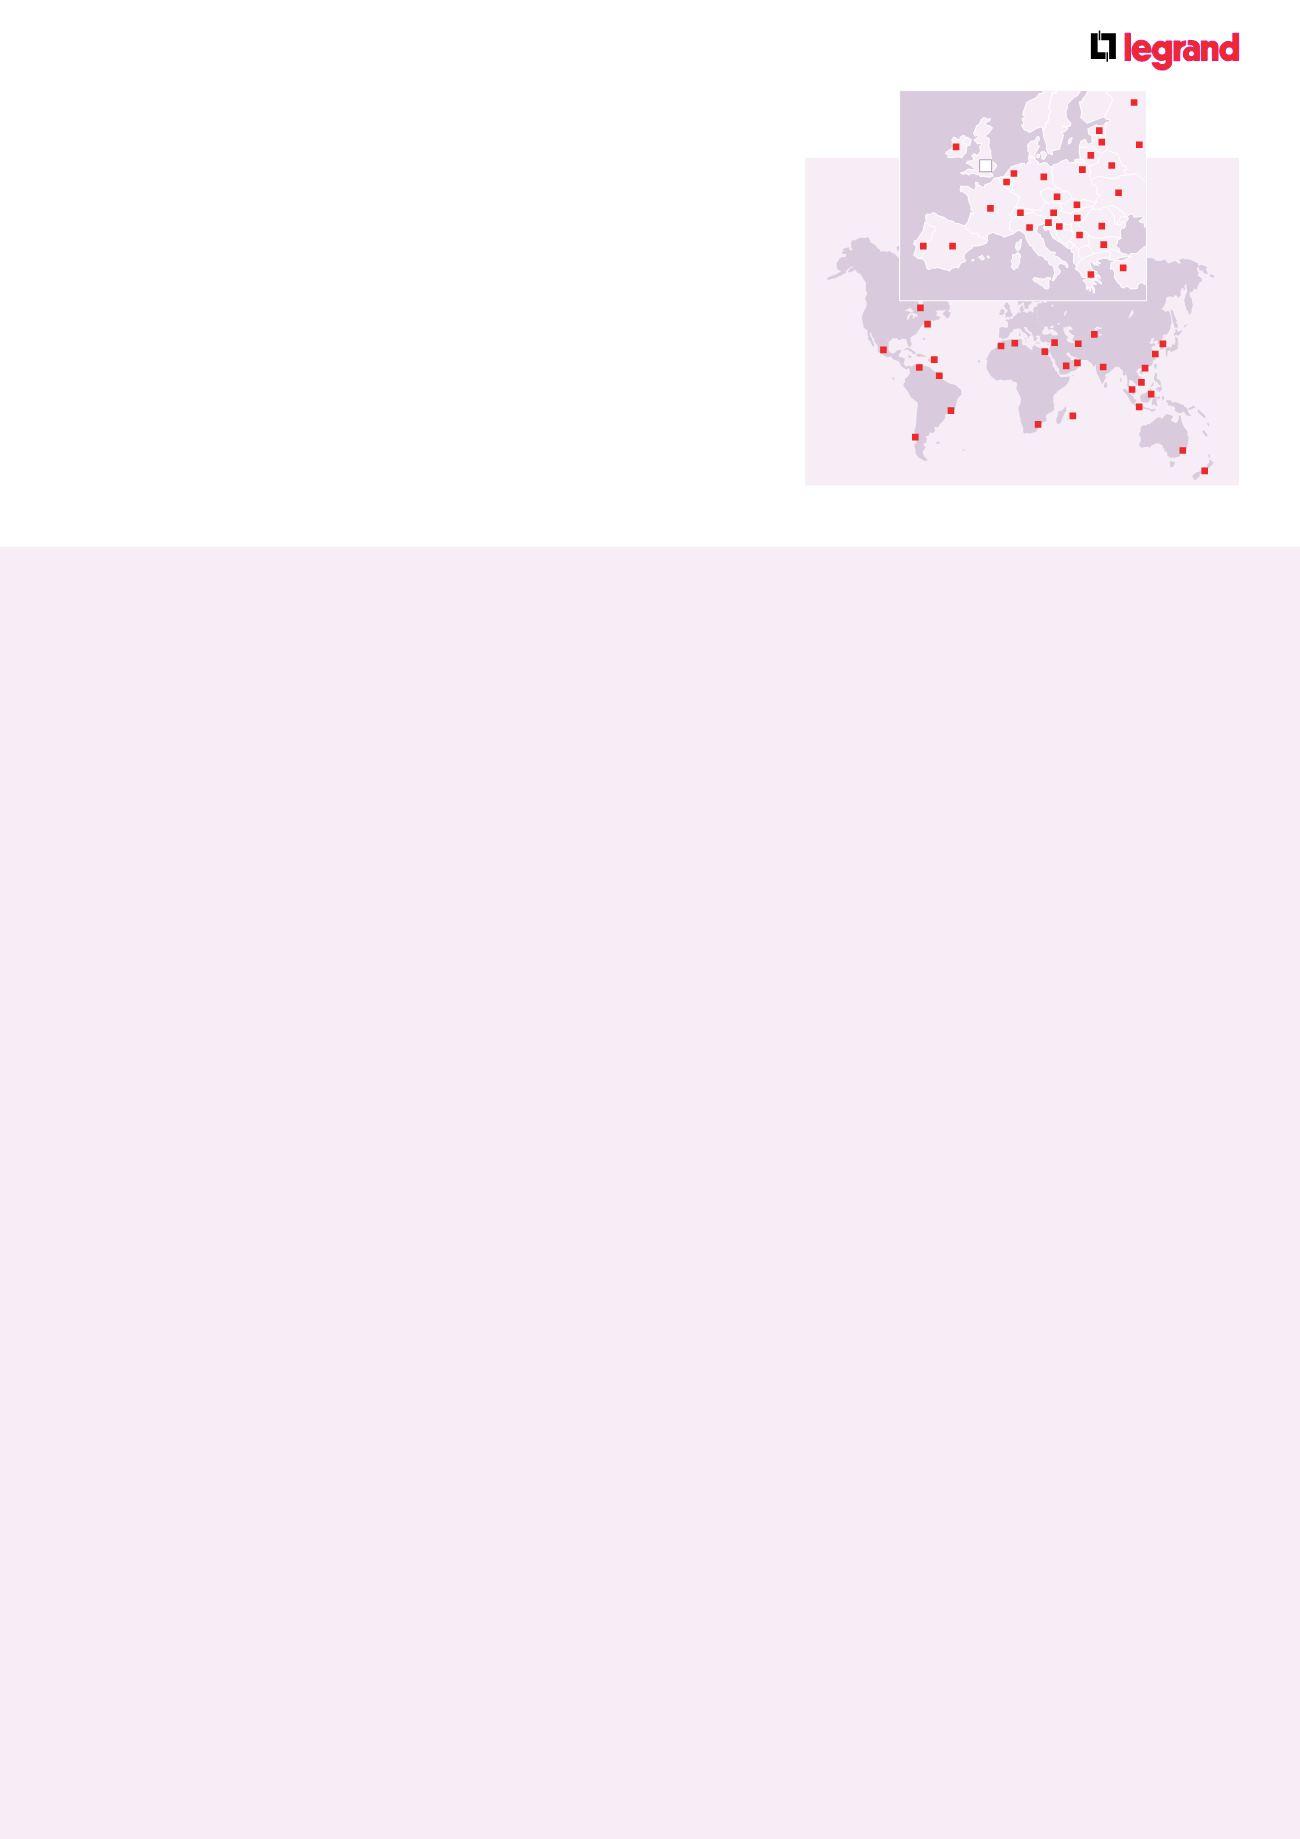 Dorable Legrand Wiring Devices Catalogue Gallery - Wiring Schematics ...